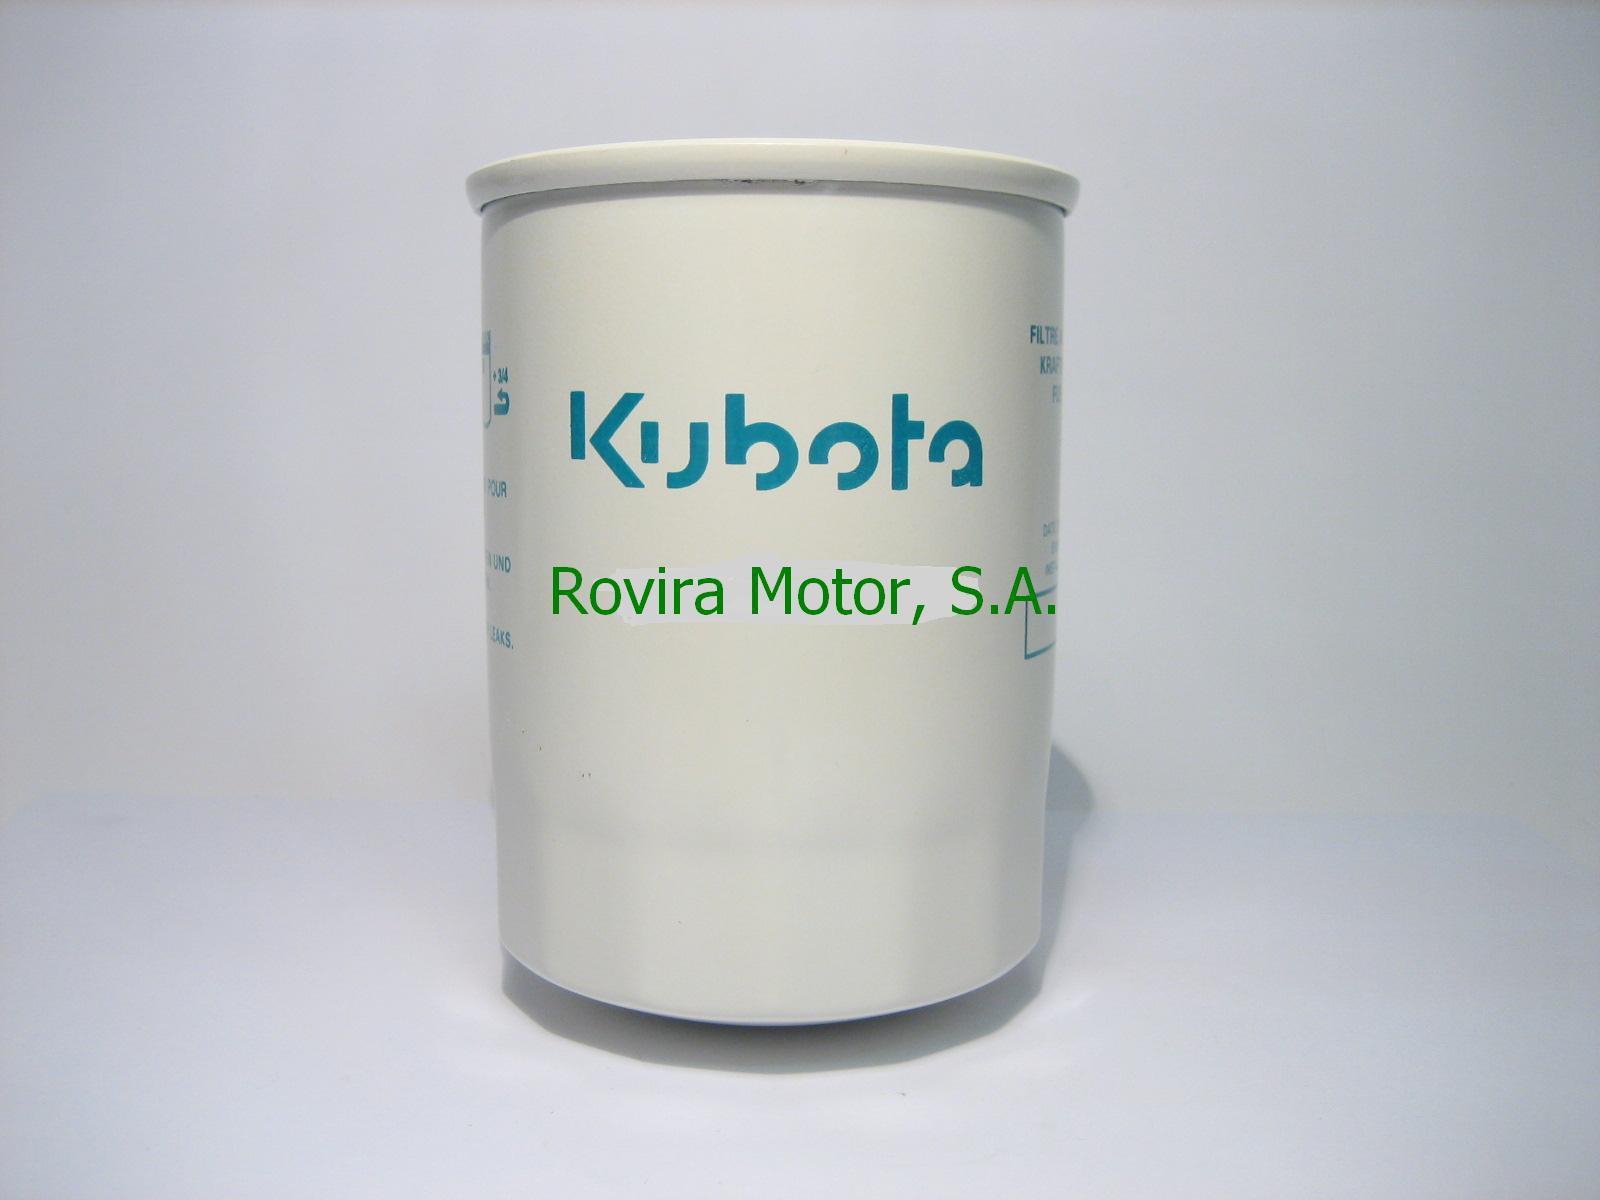 Fuel Filter Rovira Motor Sa Kubota Filters